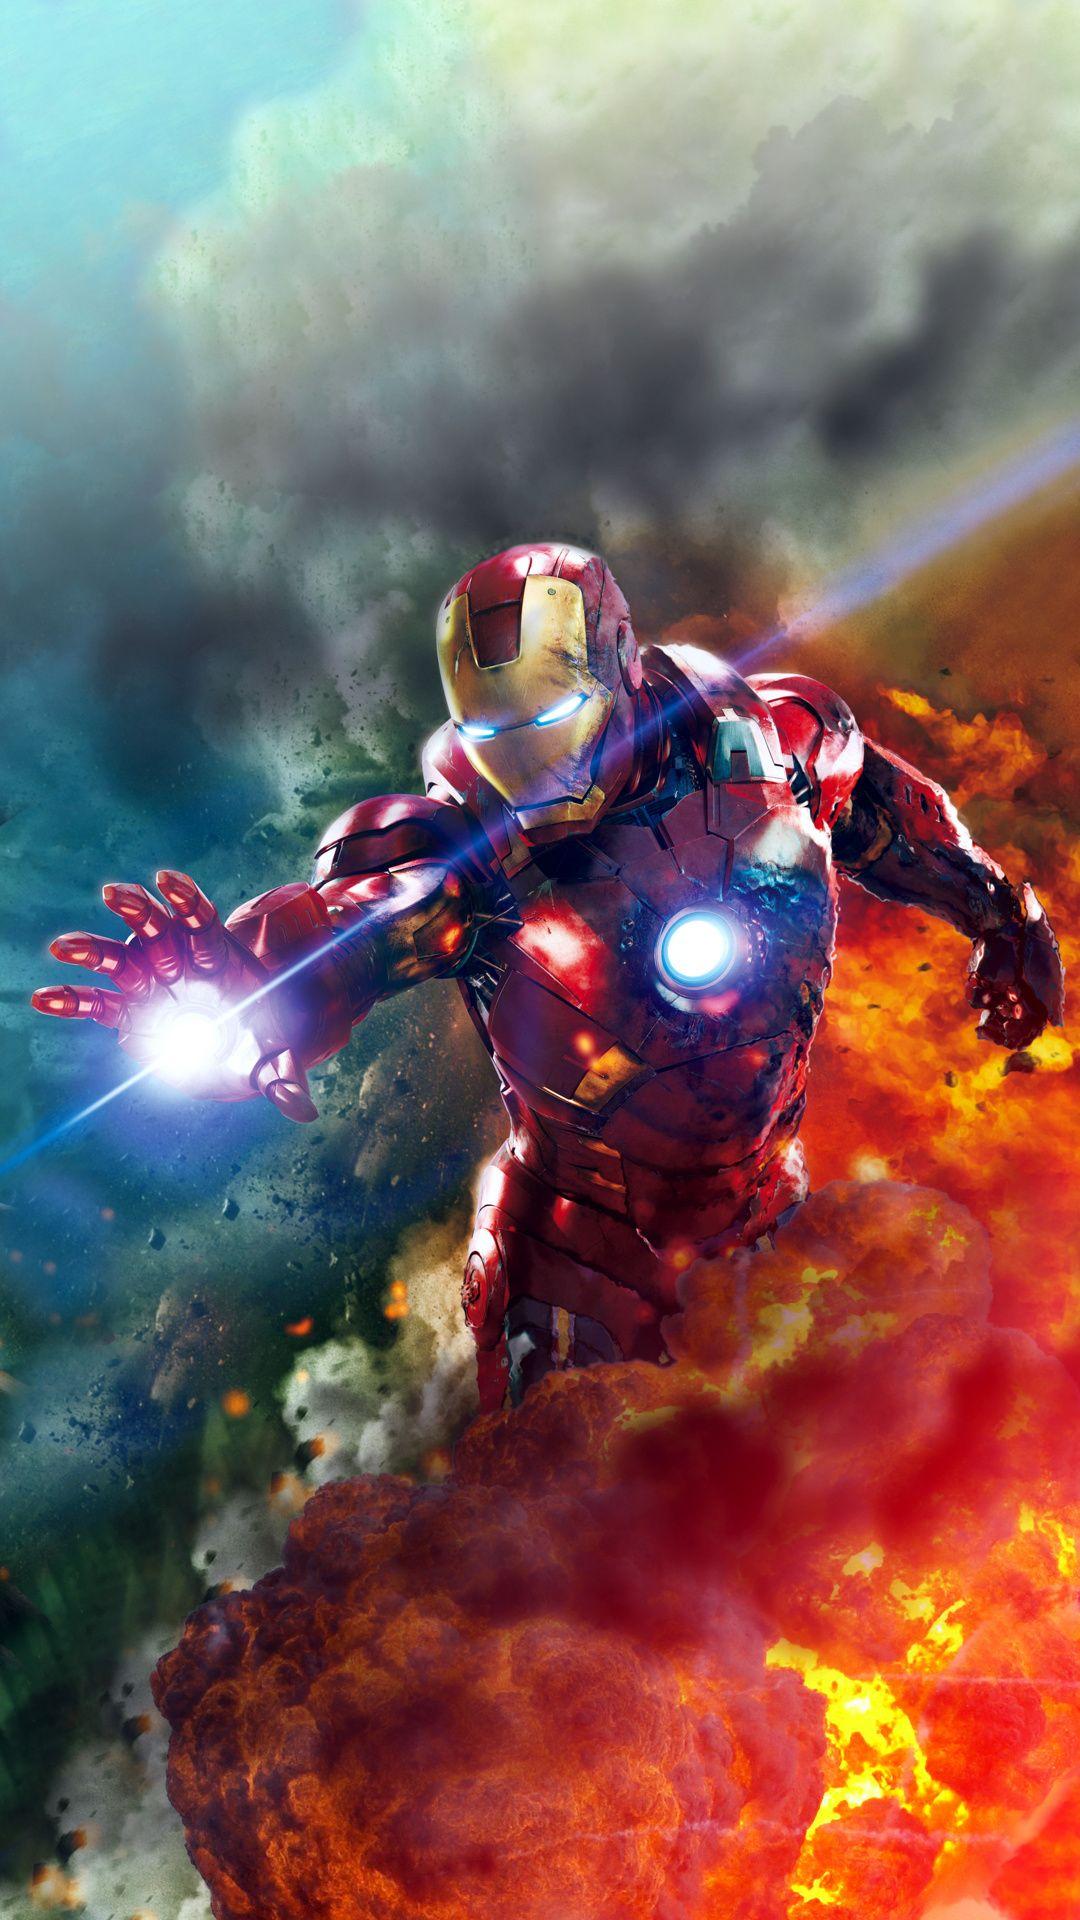 Iron Man Mobile Hd Wallpaper In 2020 Iron Man Wallpaper Iron Man Art Marvel